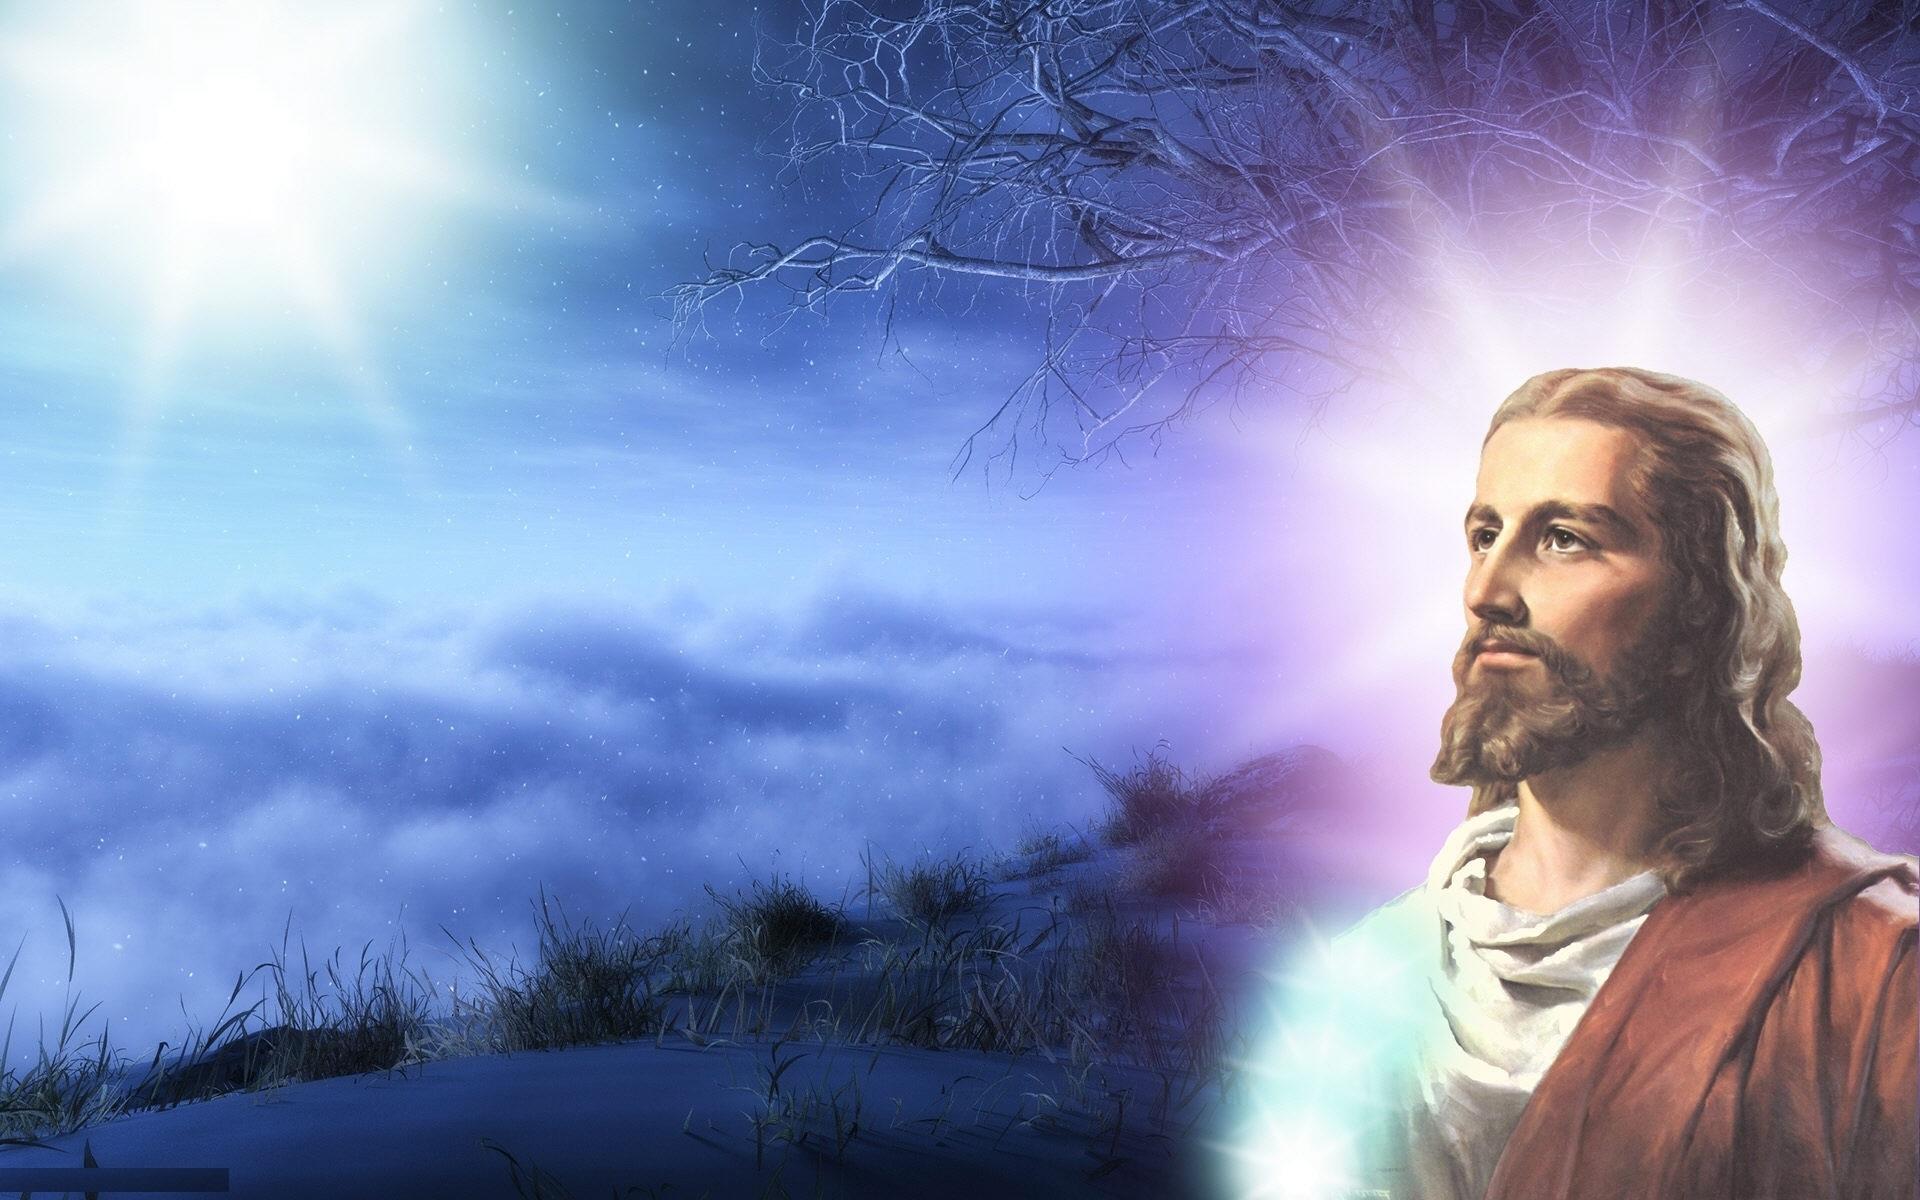 jesus christ wallpaper hd - download hd jesus christ wallpaper hd